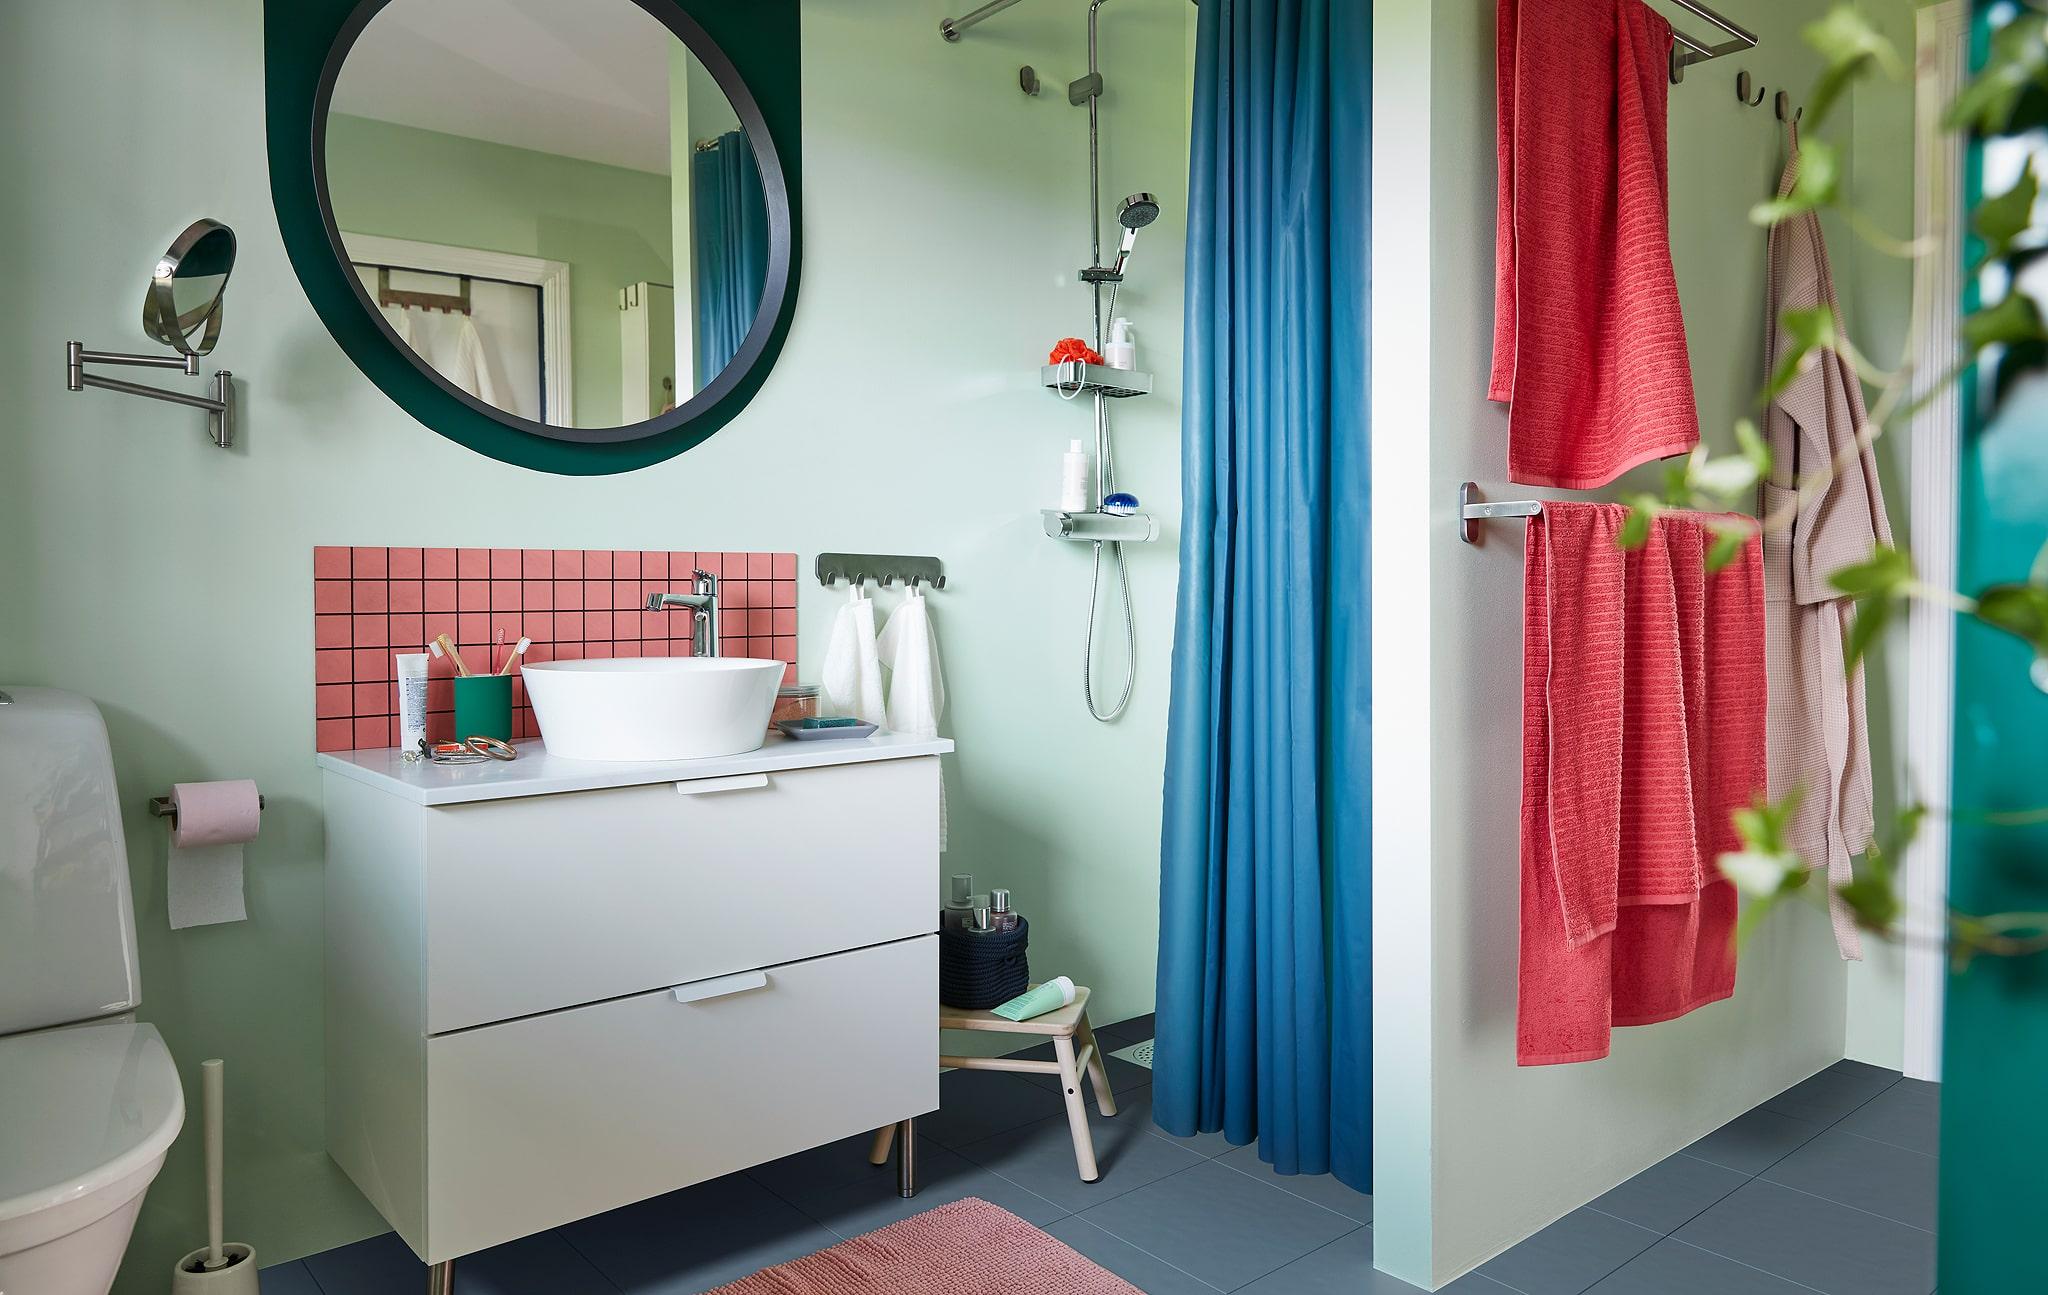 Cara menciptakan kamar mandi sibuk menjadi tempat untuk relaksasi